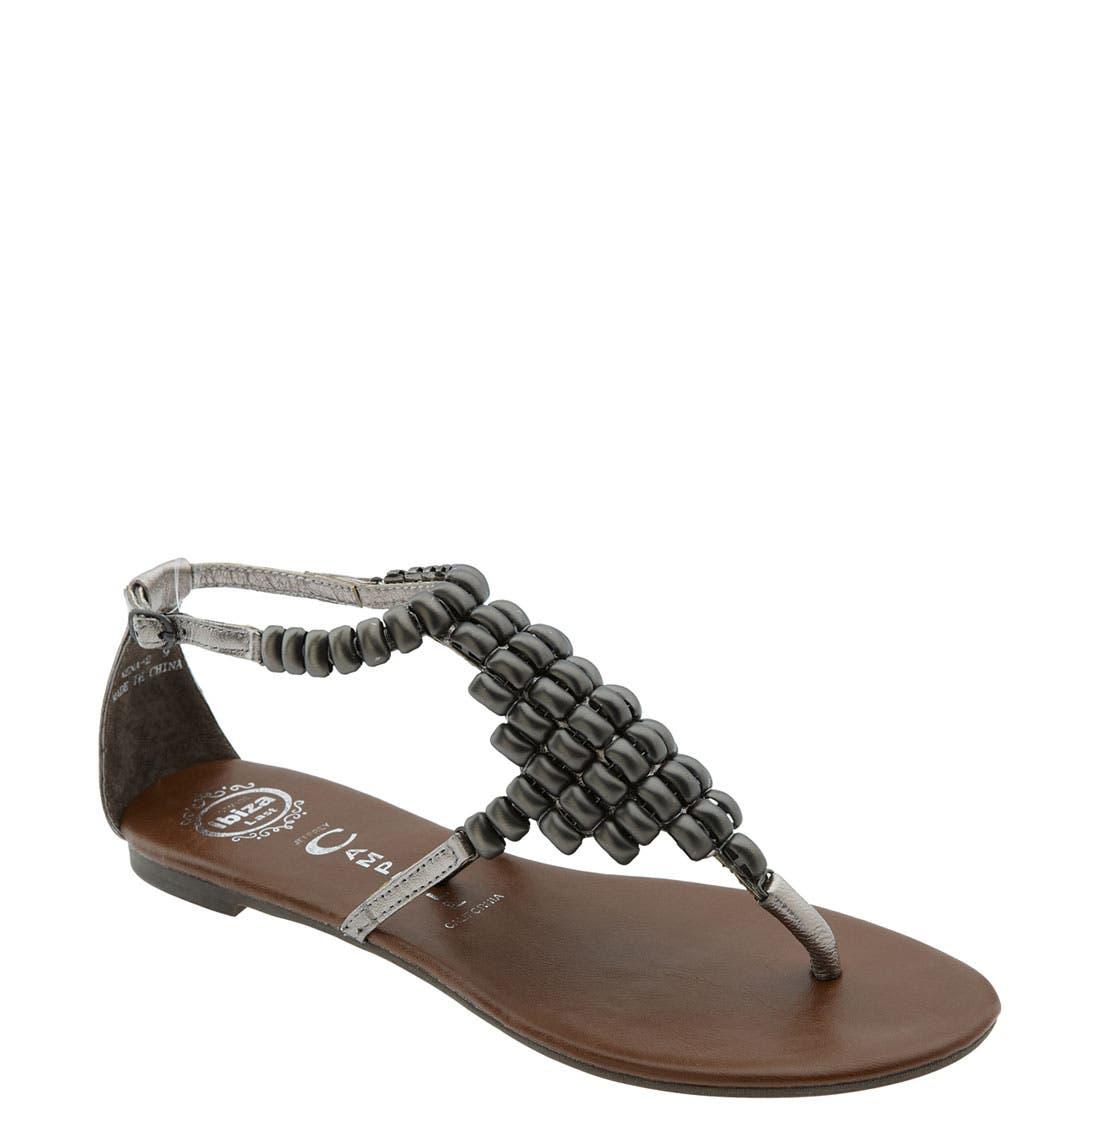 Alternate Image 1 Selected - Jeffrey Campbell 'Nena 2' Sandal